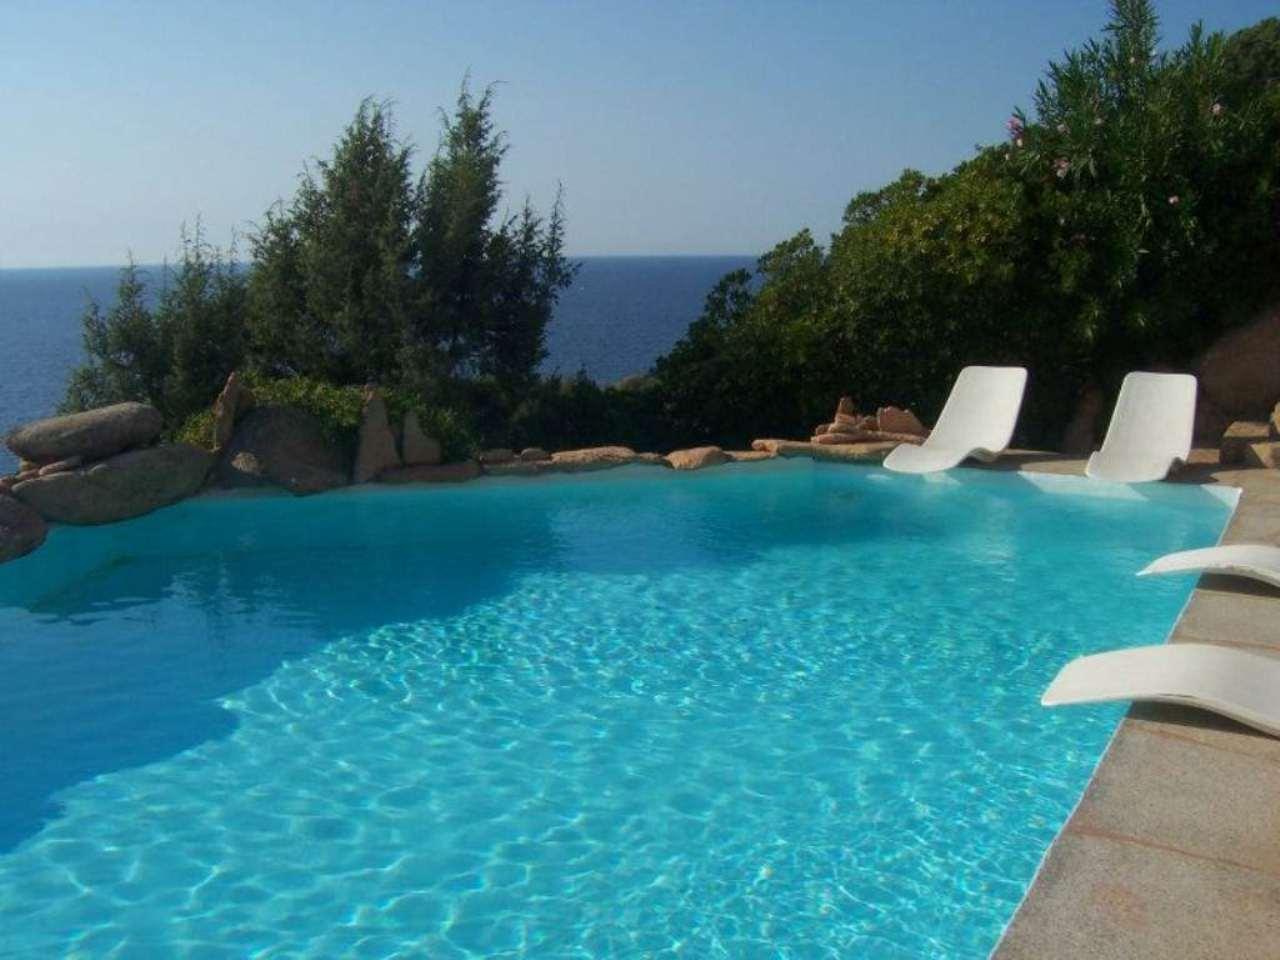 Villa in vendita a Trinità d'Agultu e Vignola, 5 locali, Trattative riservate | Cambio Casa.it